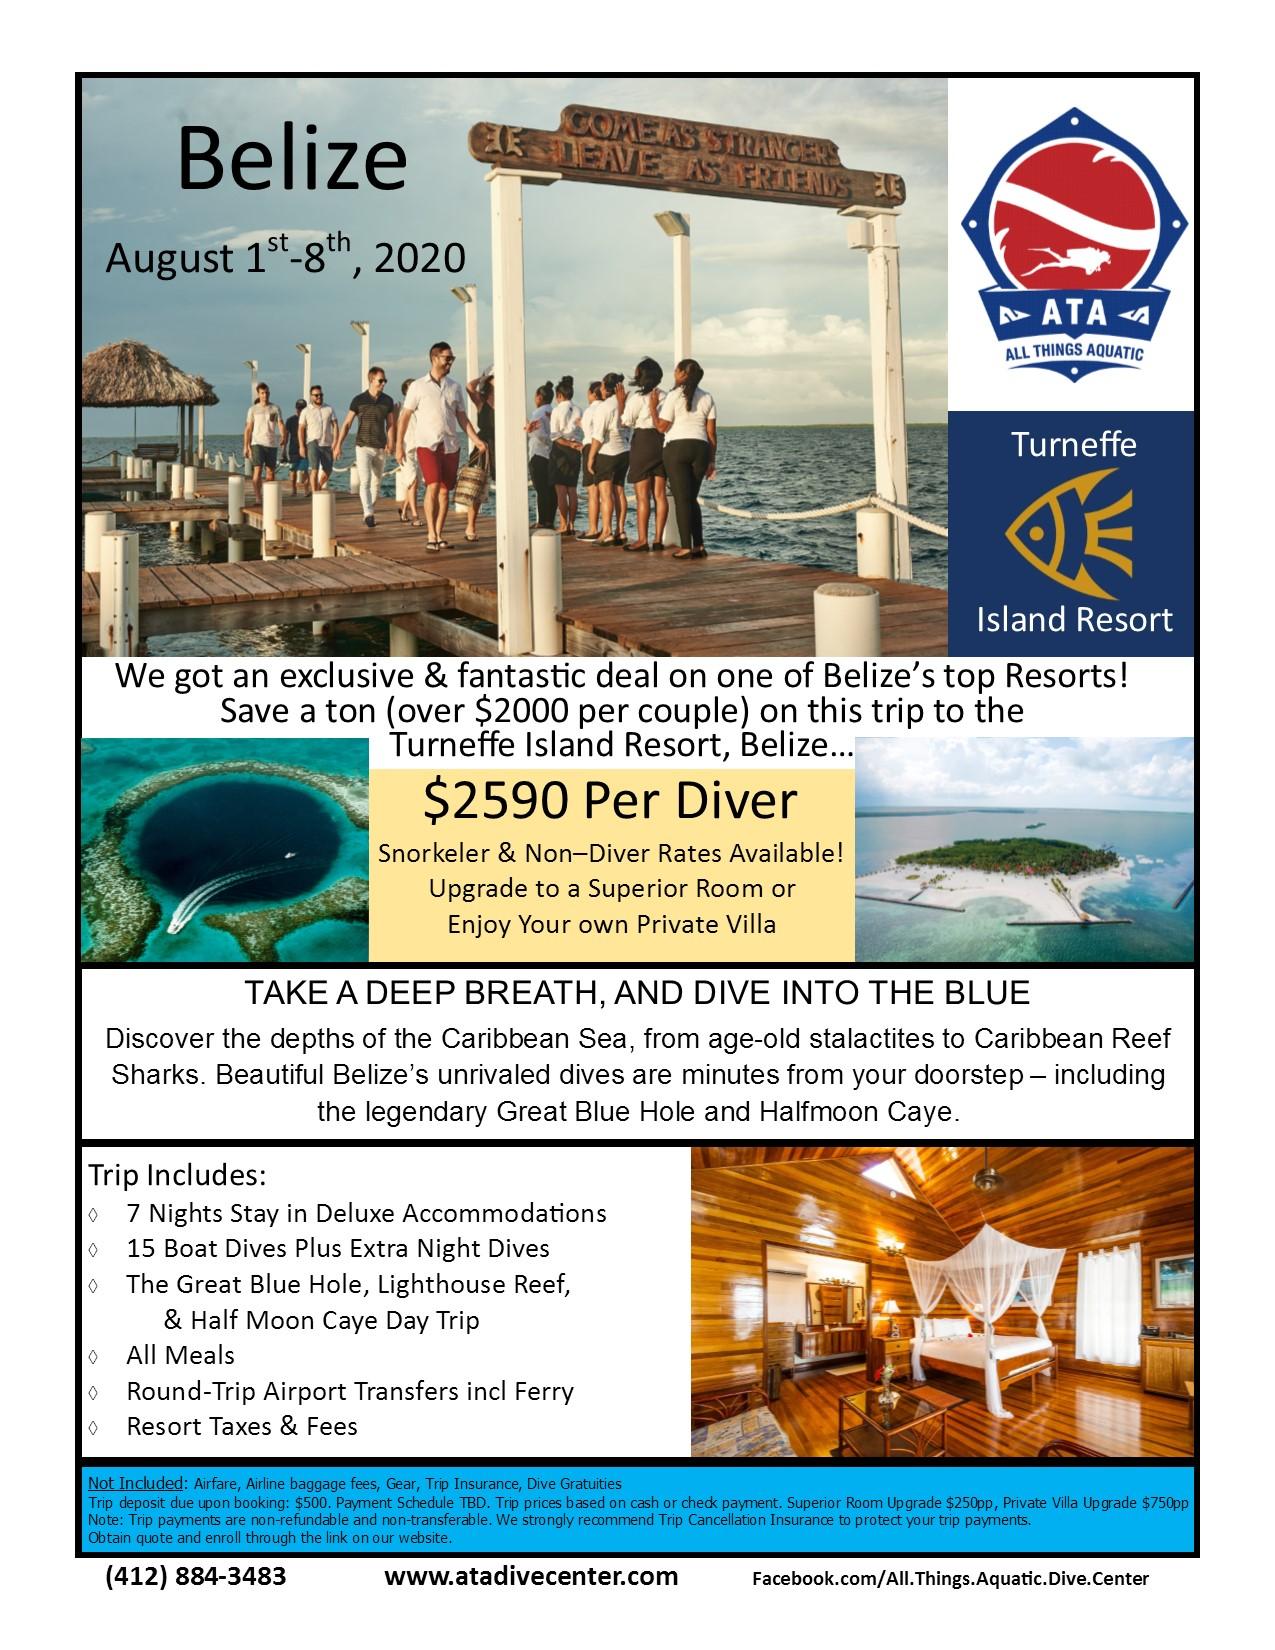 Belize - Turneffe Island Resort Aug 1st-8th, 2020